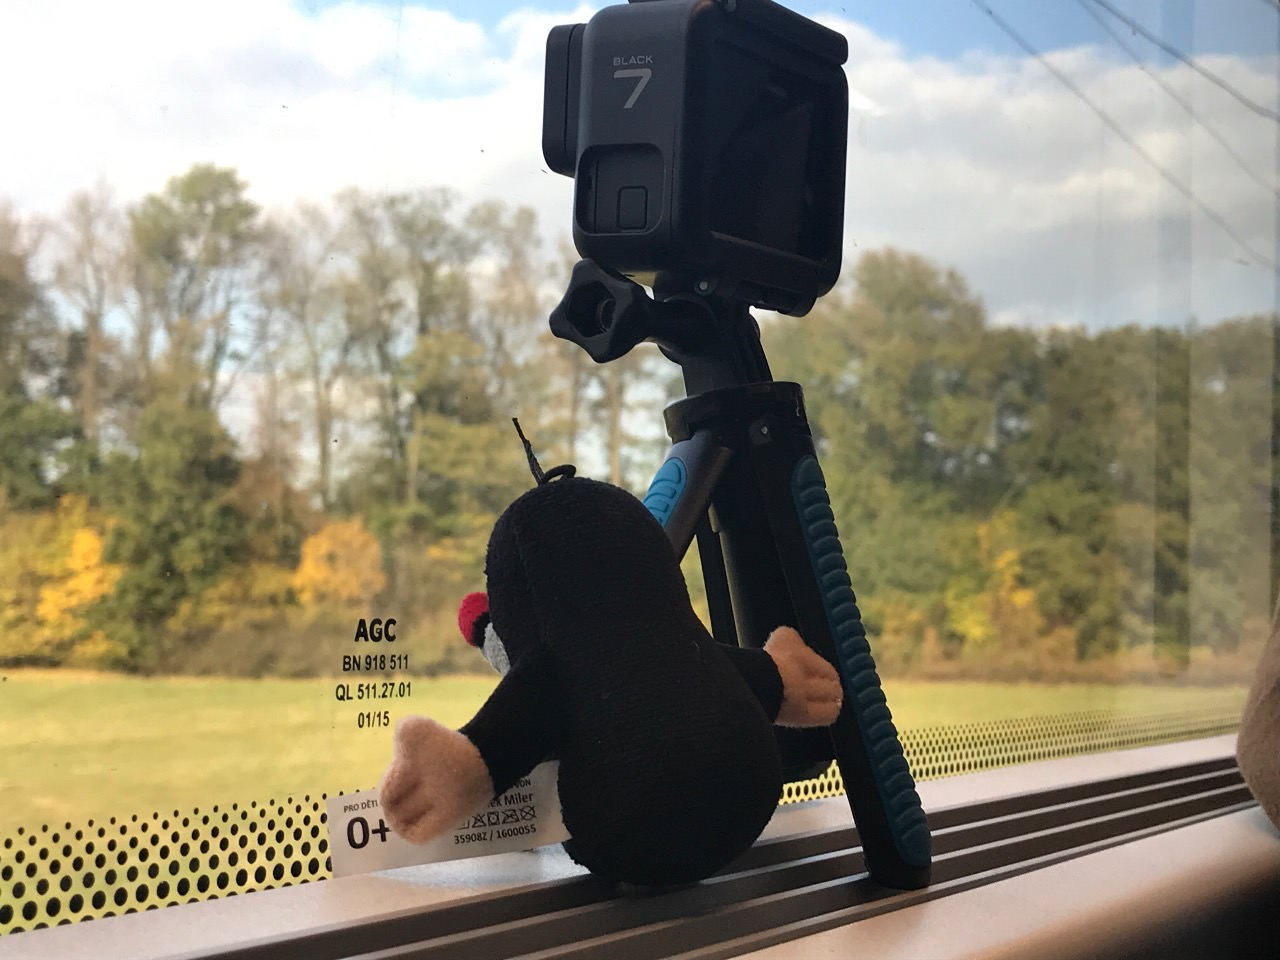 【GoPro7】チェコの鉄道「RegioJet」でタイムラプス撮影! #チェコへ行こう #cz100y